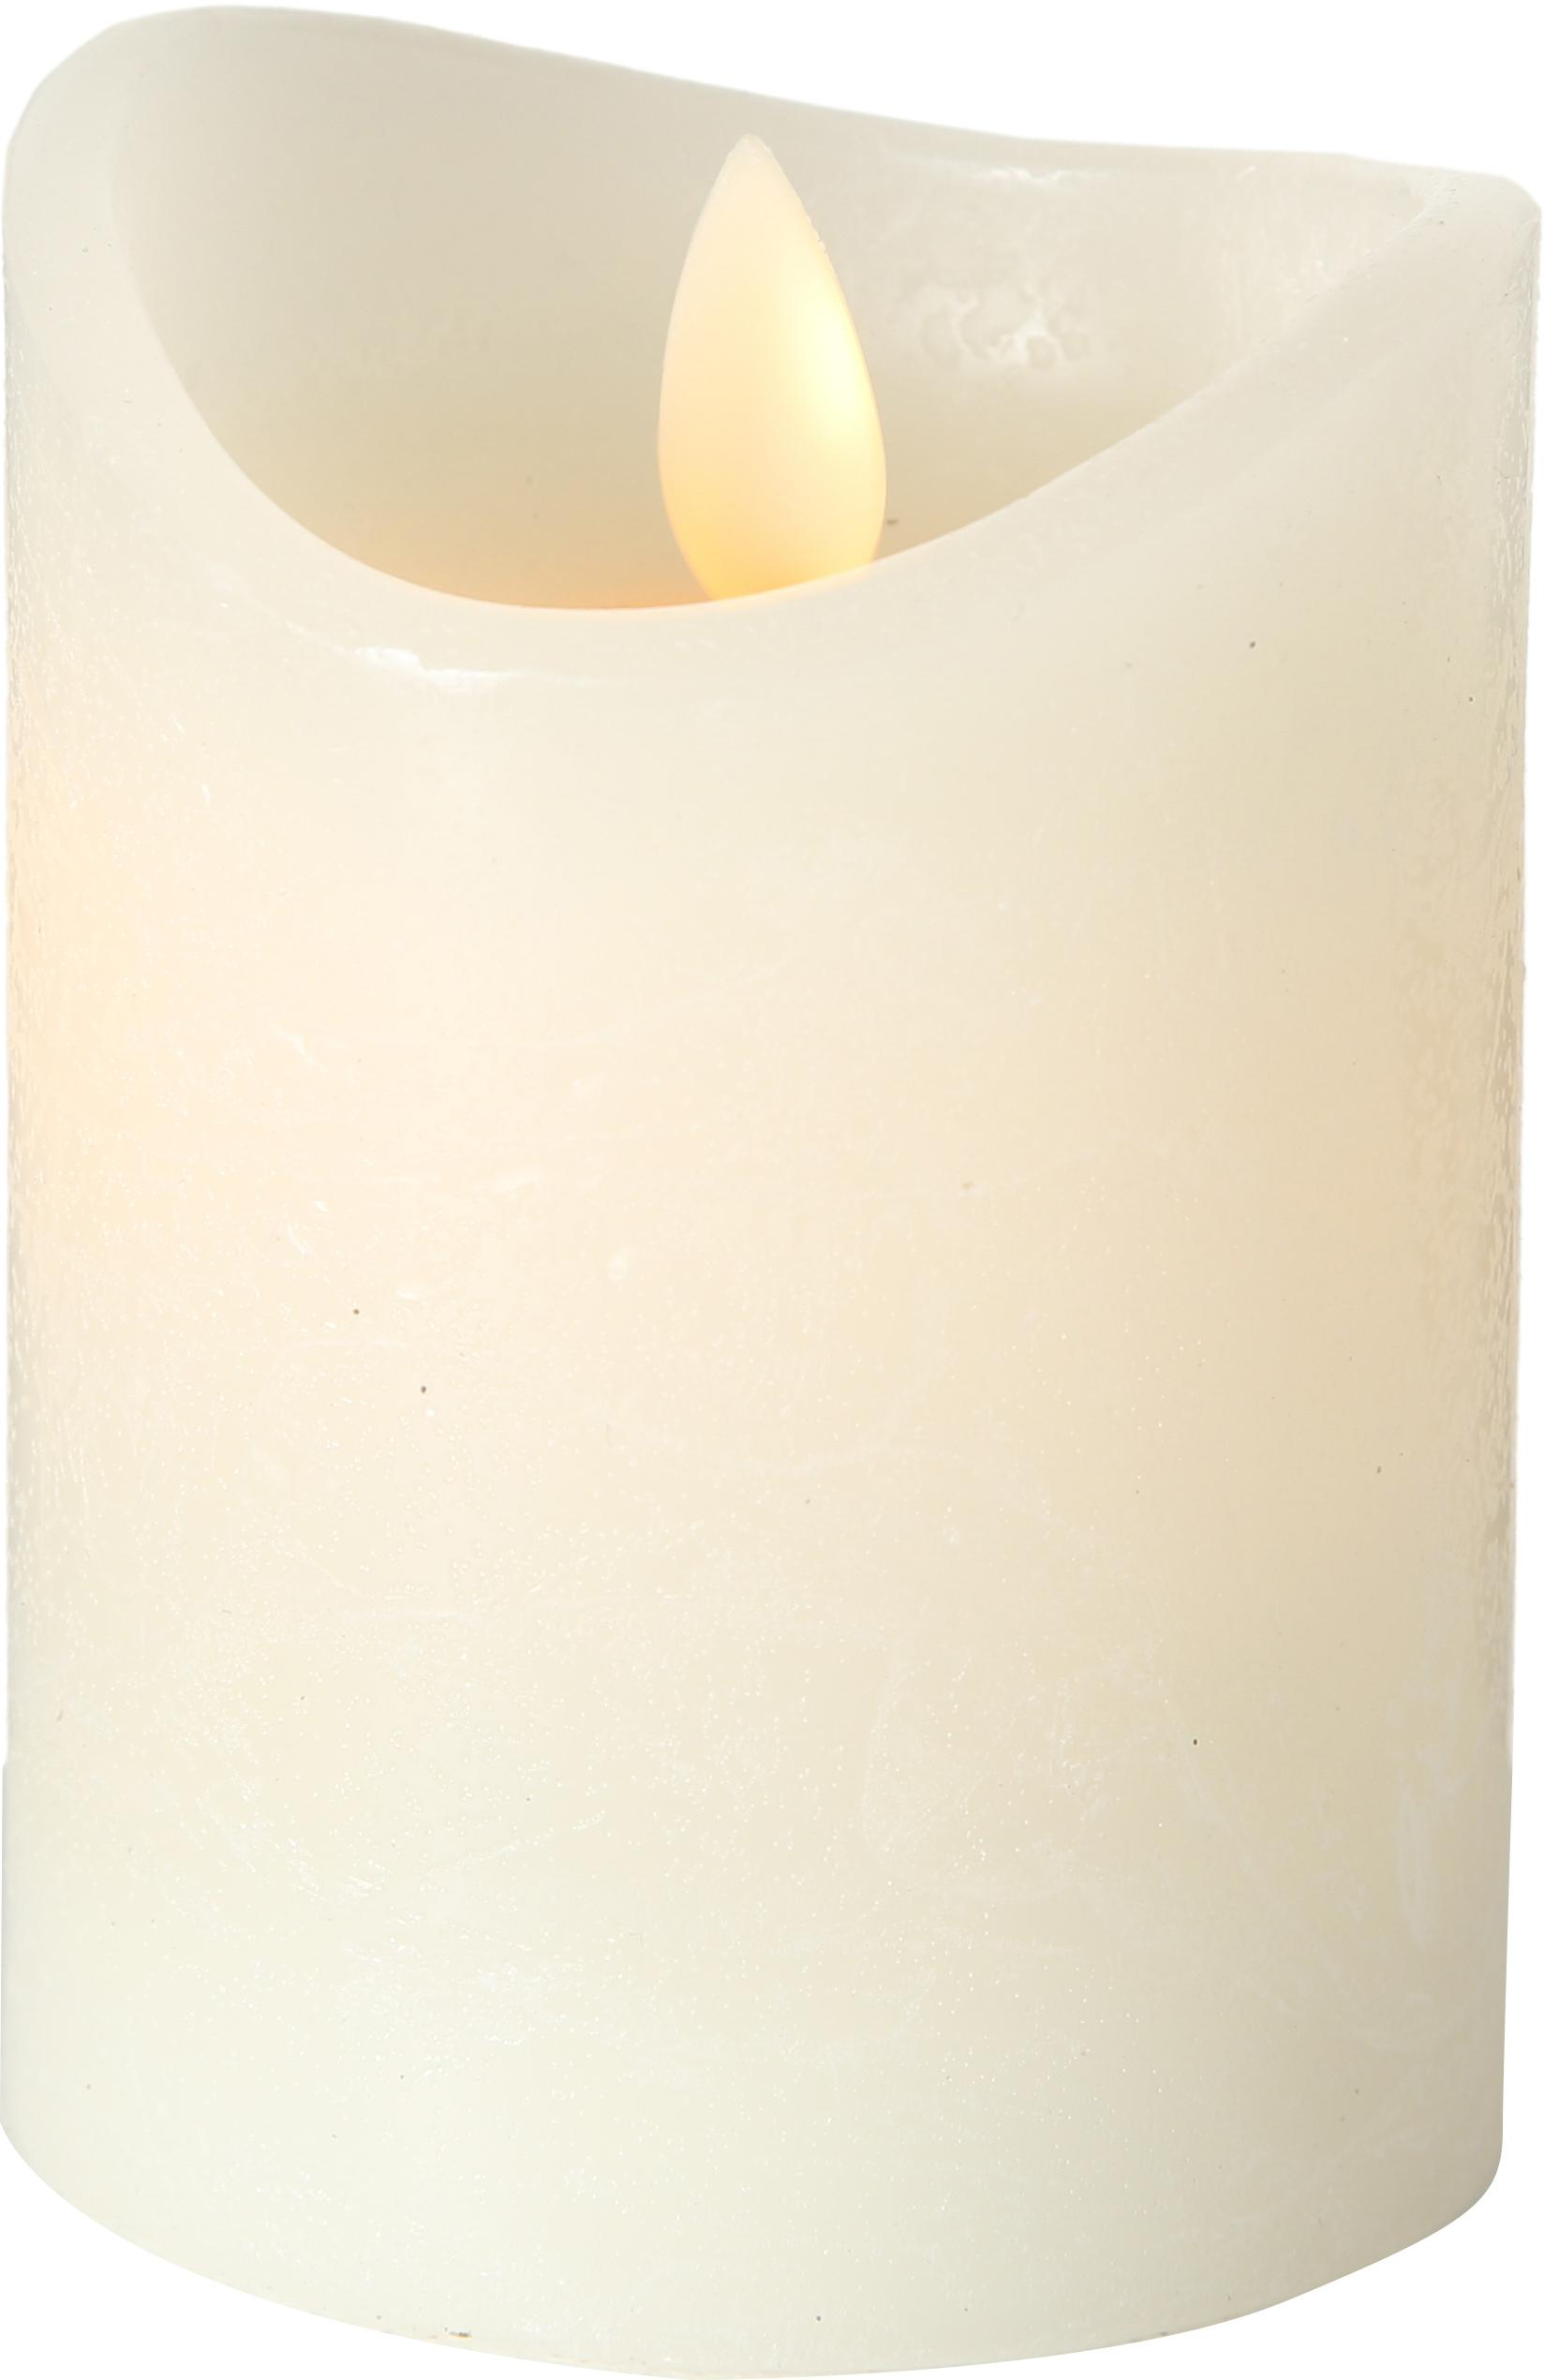 LED Kerze Bino, Cremefarben, Ø 8 x H 10 cm